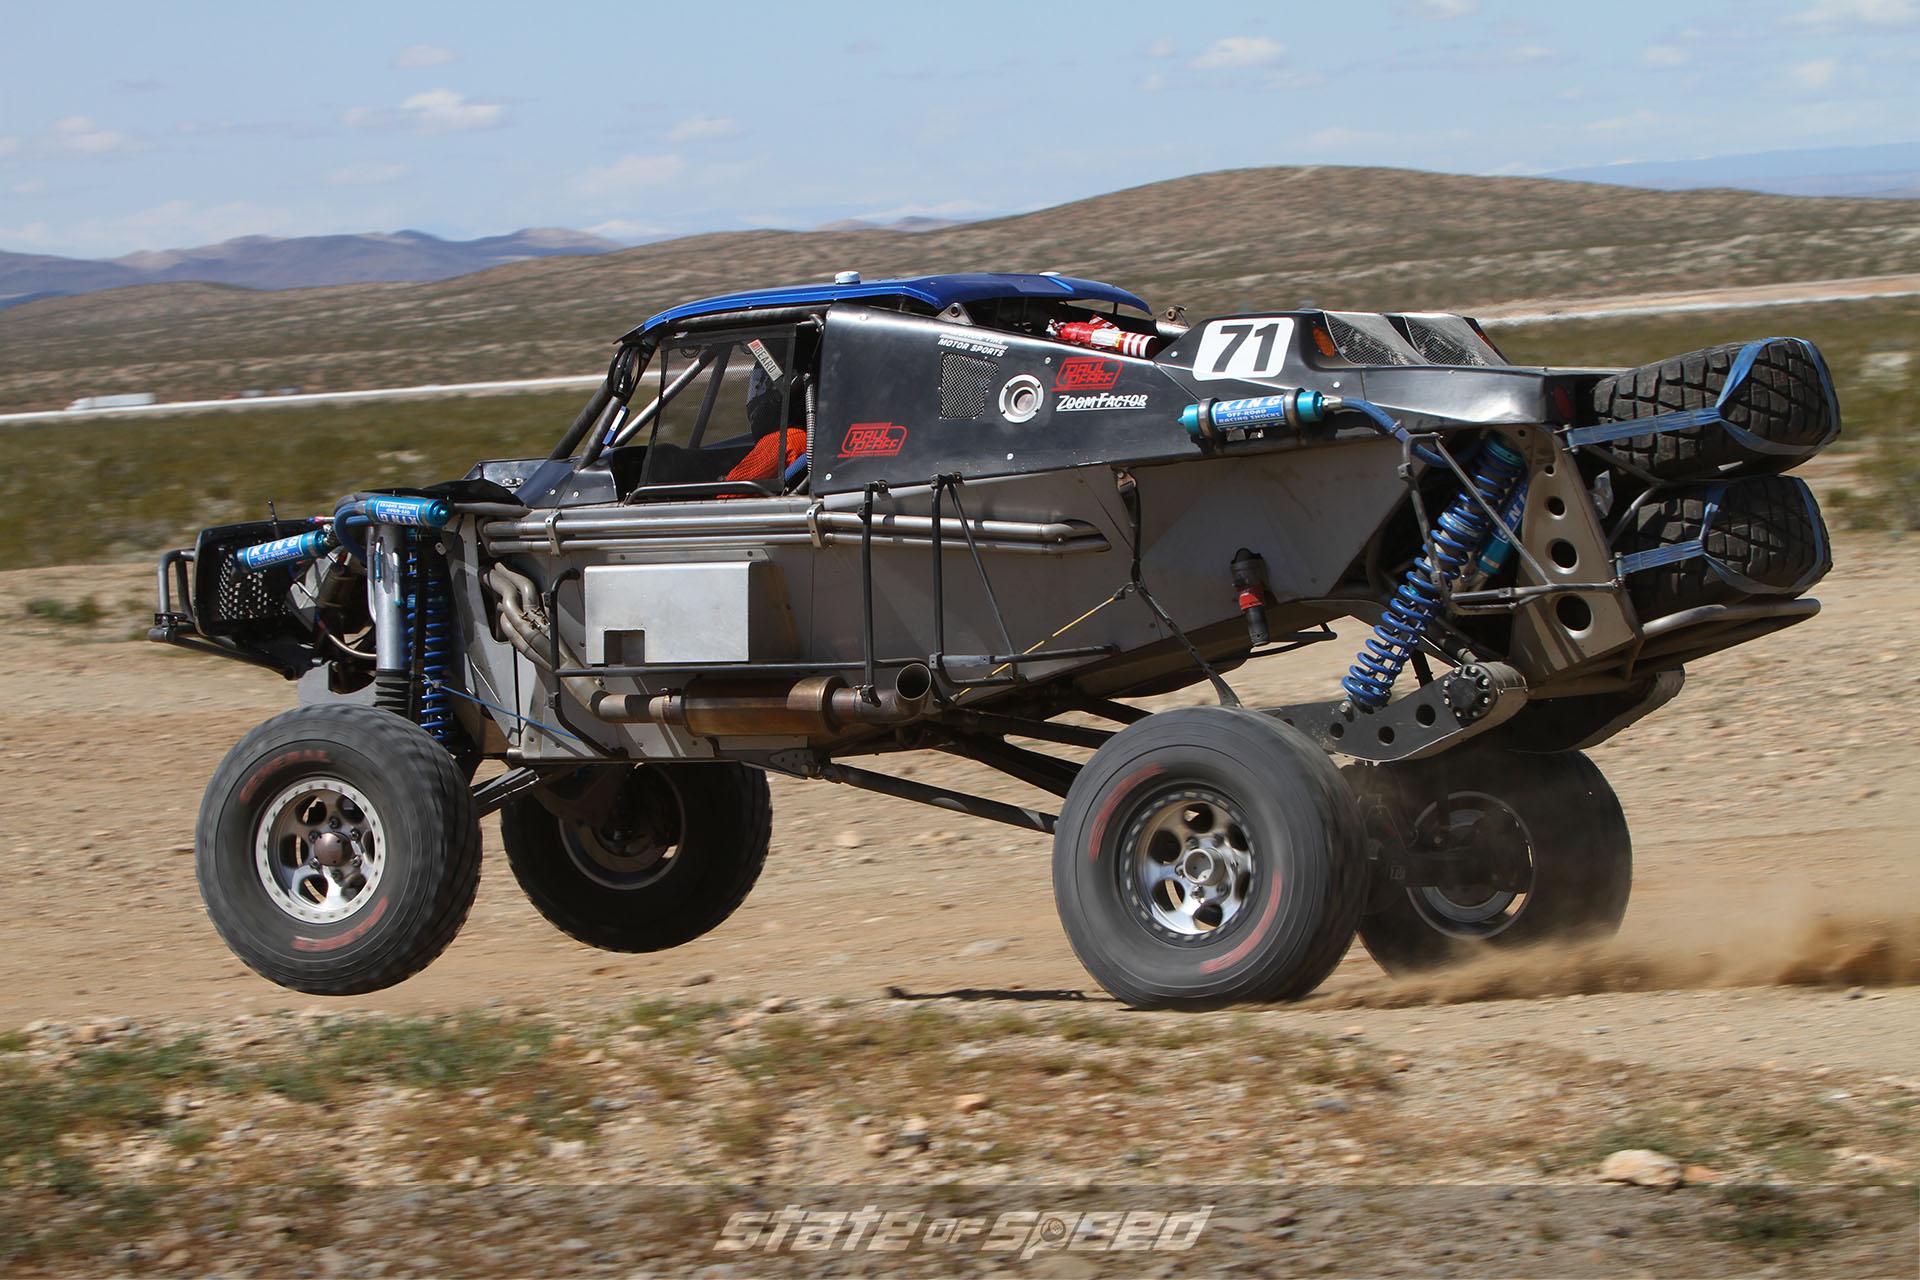 Race UTV getting air